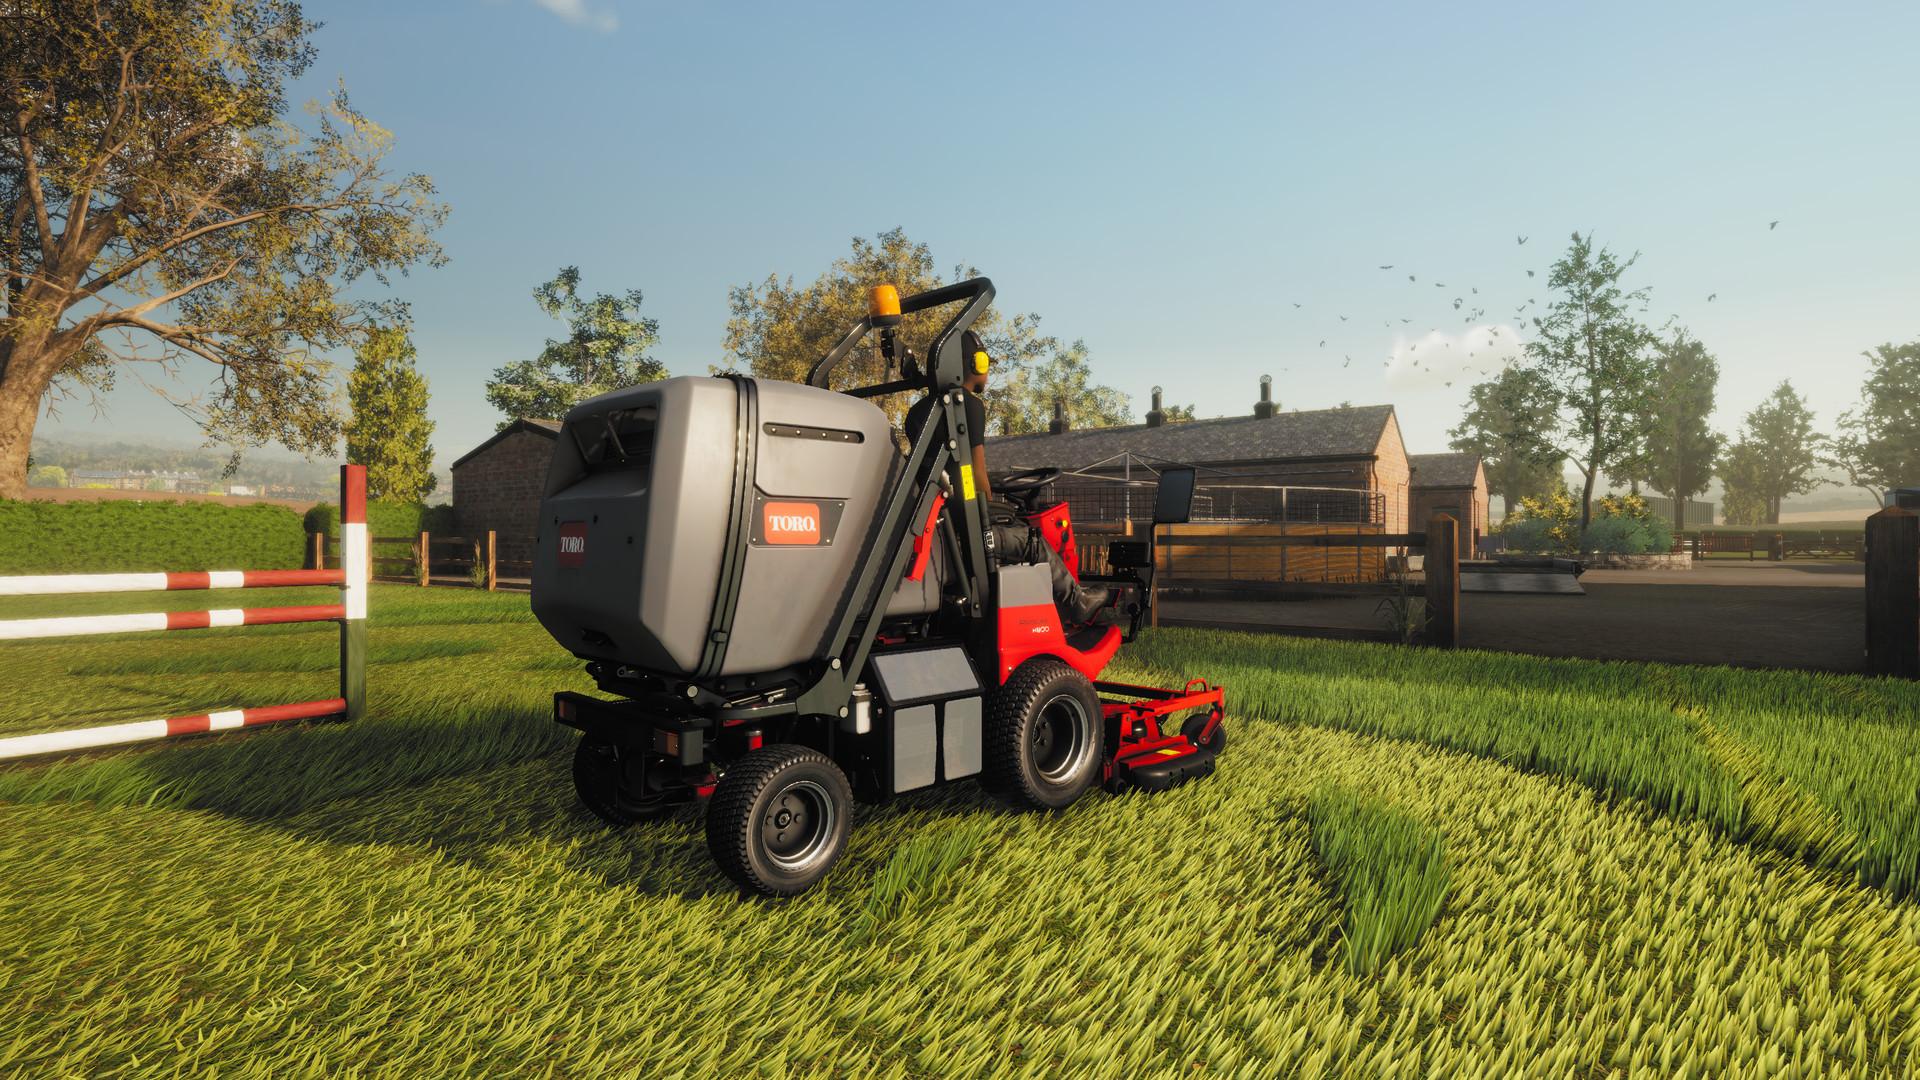 Lawn Mowing Simulator Xbox Series X & S